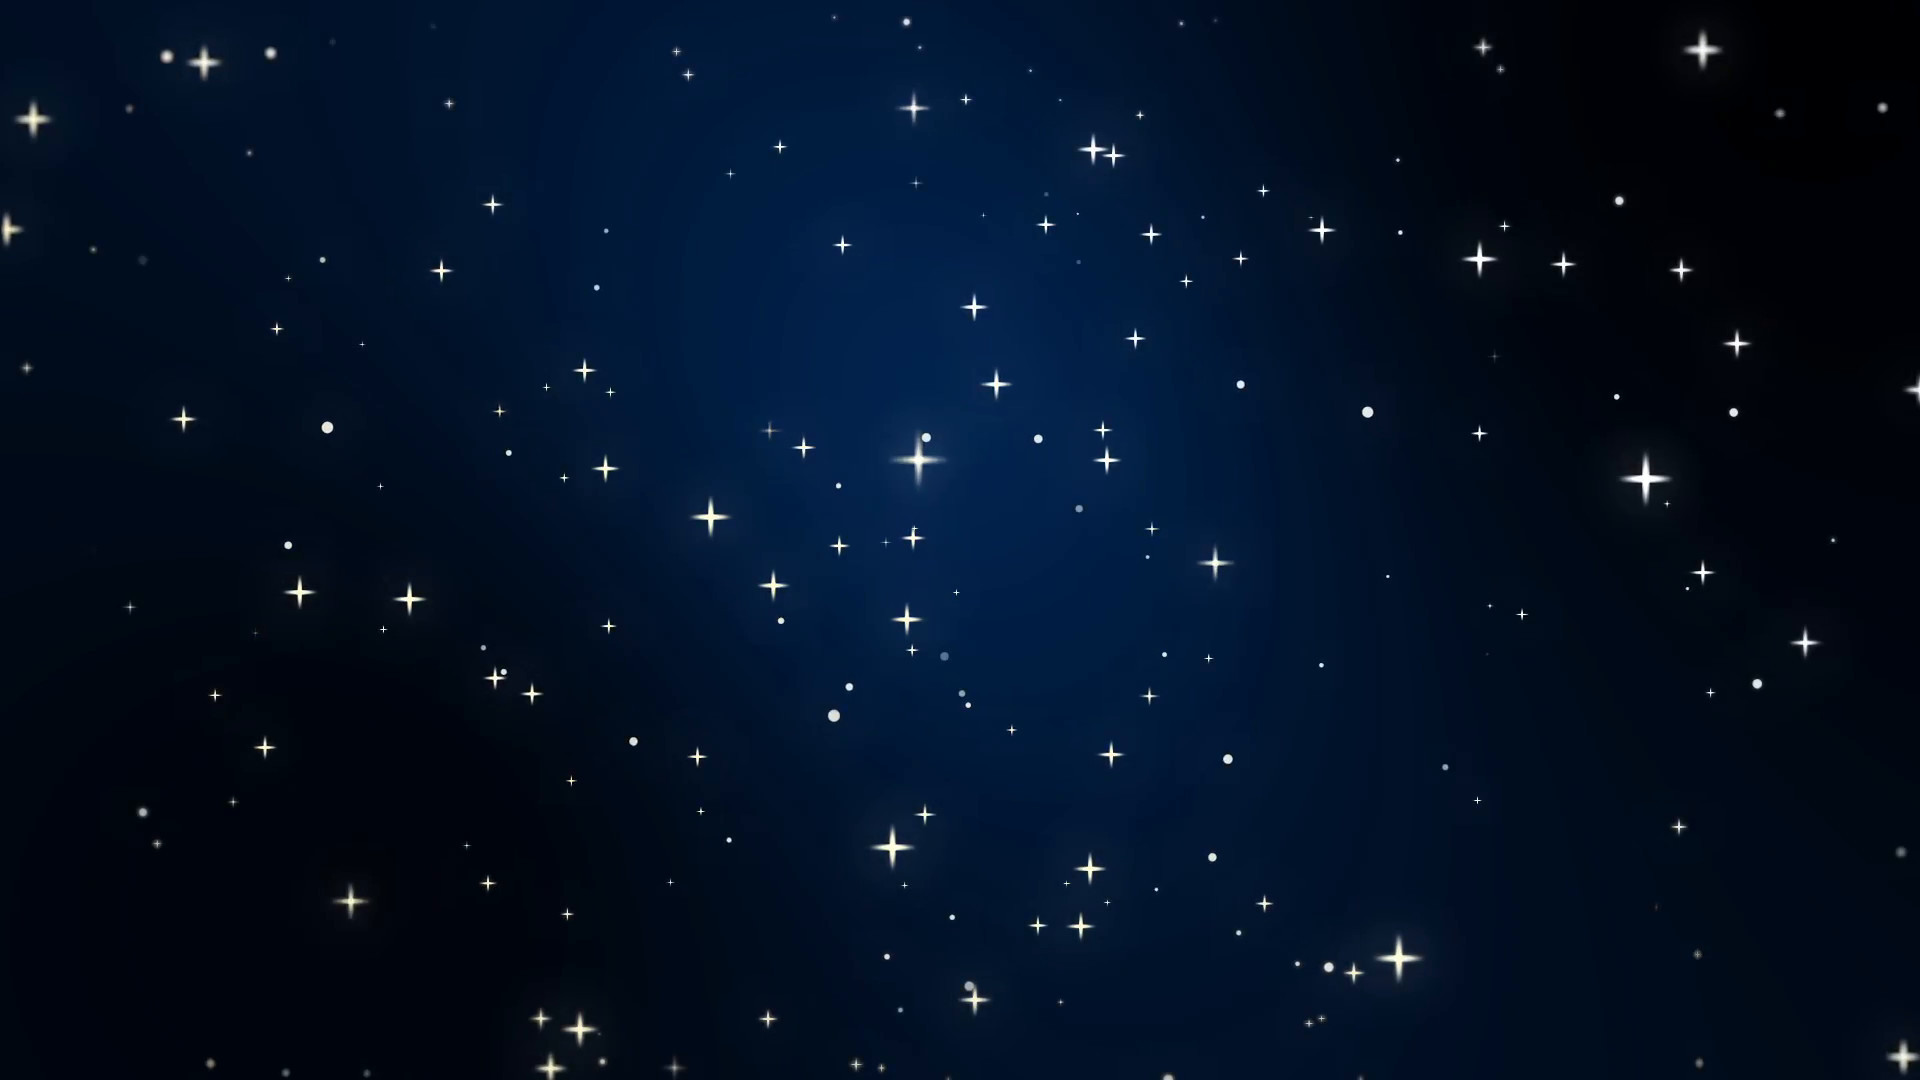 Falling Stars Grunge Wallpaper Dark Blue Background Images 183 ① Wallpapertag